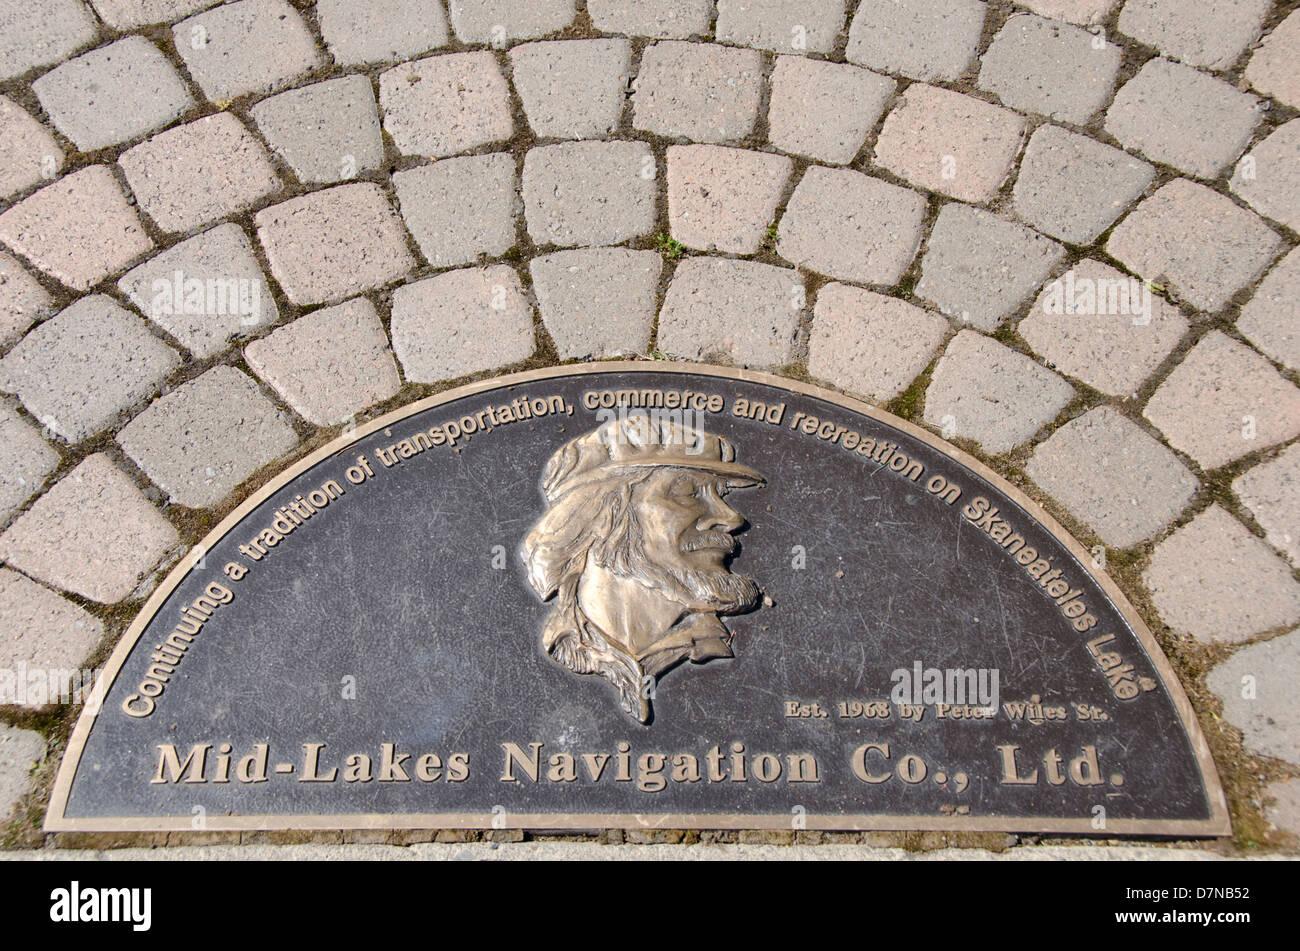 New York, Skaneateles. Skaneateles Lake, one of the Finger Lakes. Mid-Lakes Navigation Co. market. Stock Photo